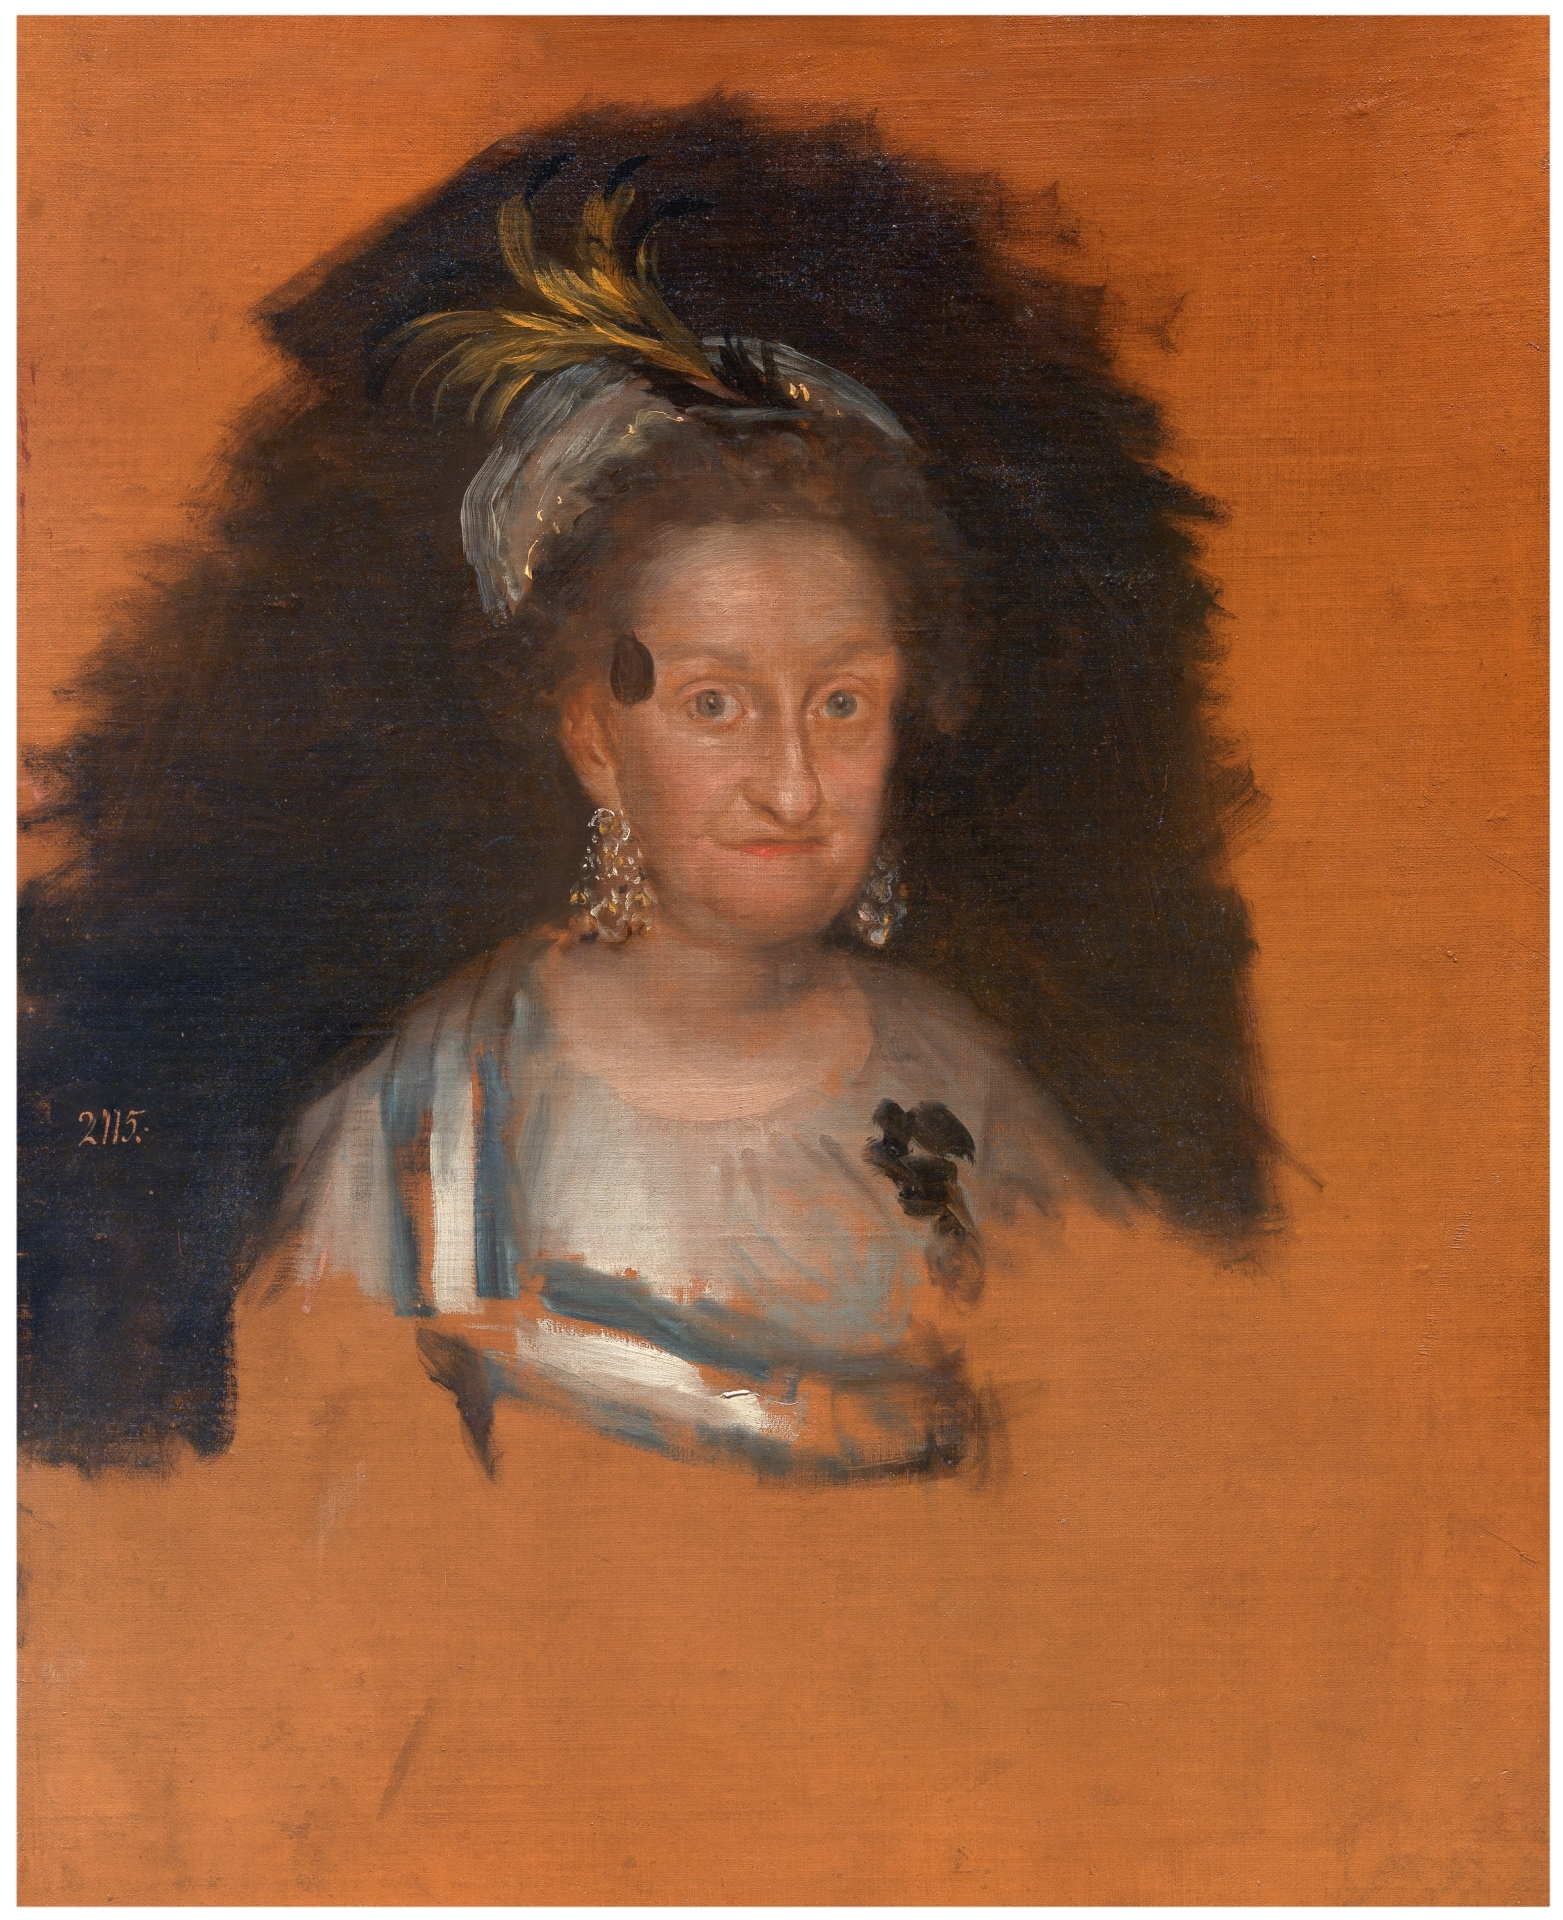 Forum on this topic: Elle Macpherson AUS, maria-isabel-lopez-b-1957/